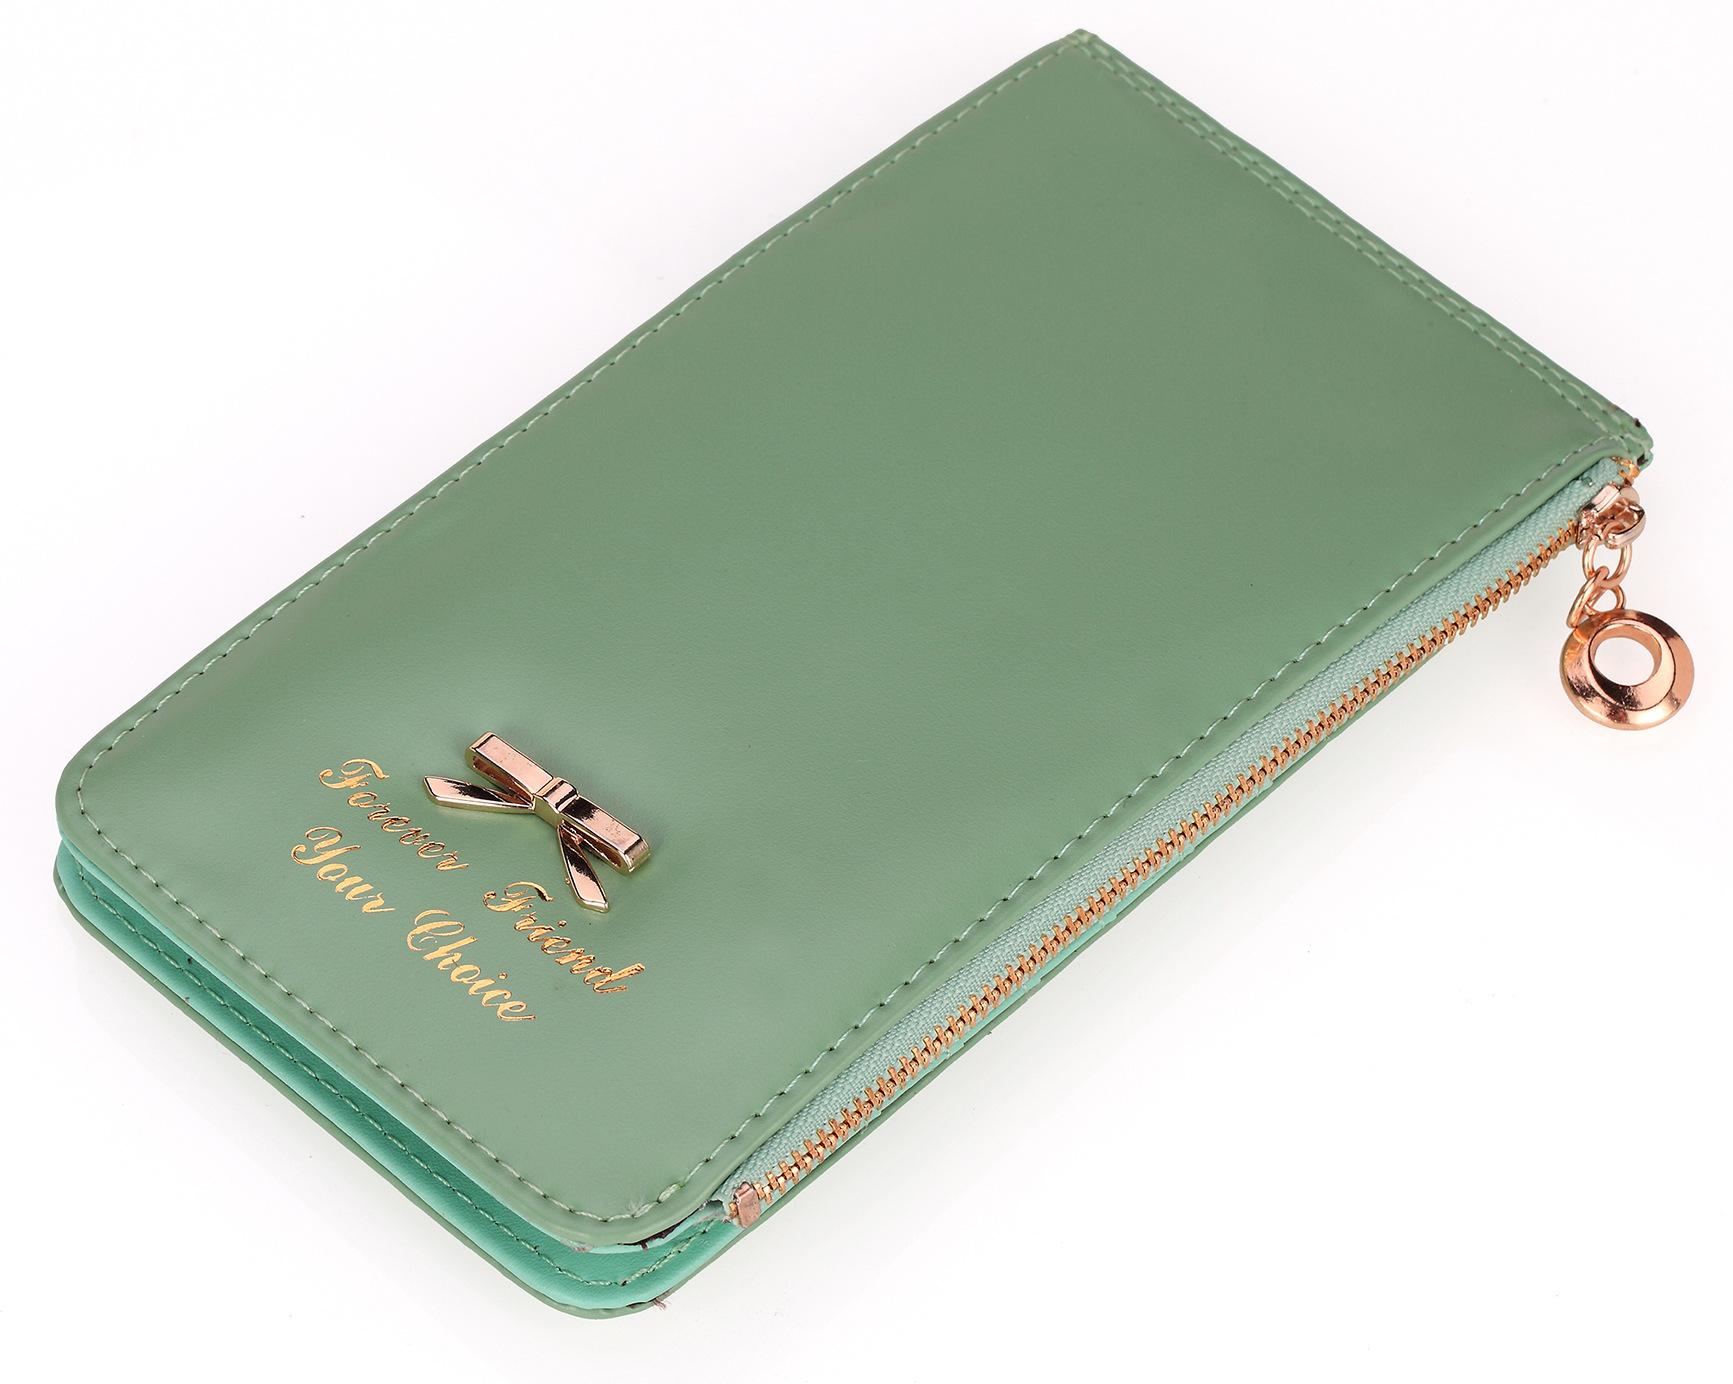 NEW Special Design Women Wallets PU Female Bag Clutch Lady Purse Brand Vintage Bowknot Elegant ID Card Holder Hasp BB024-SZ(China (Mainland))